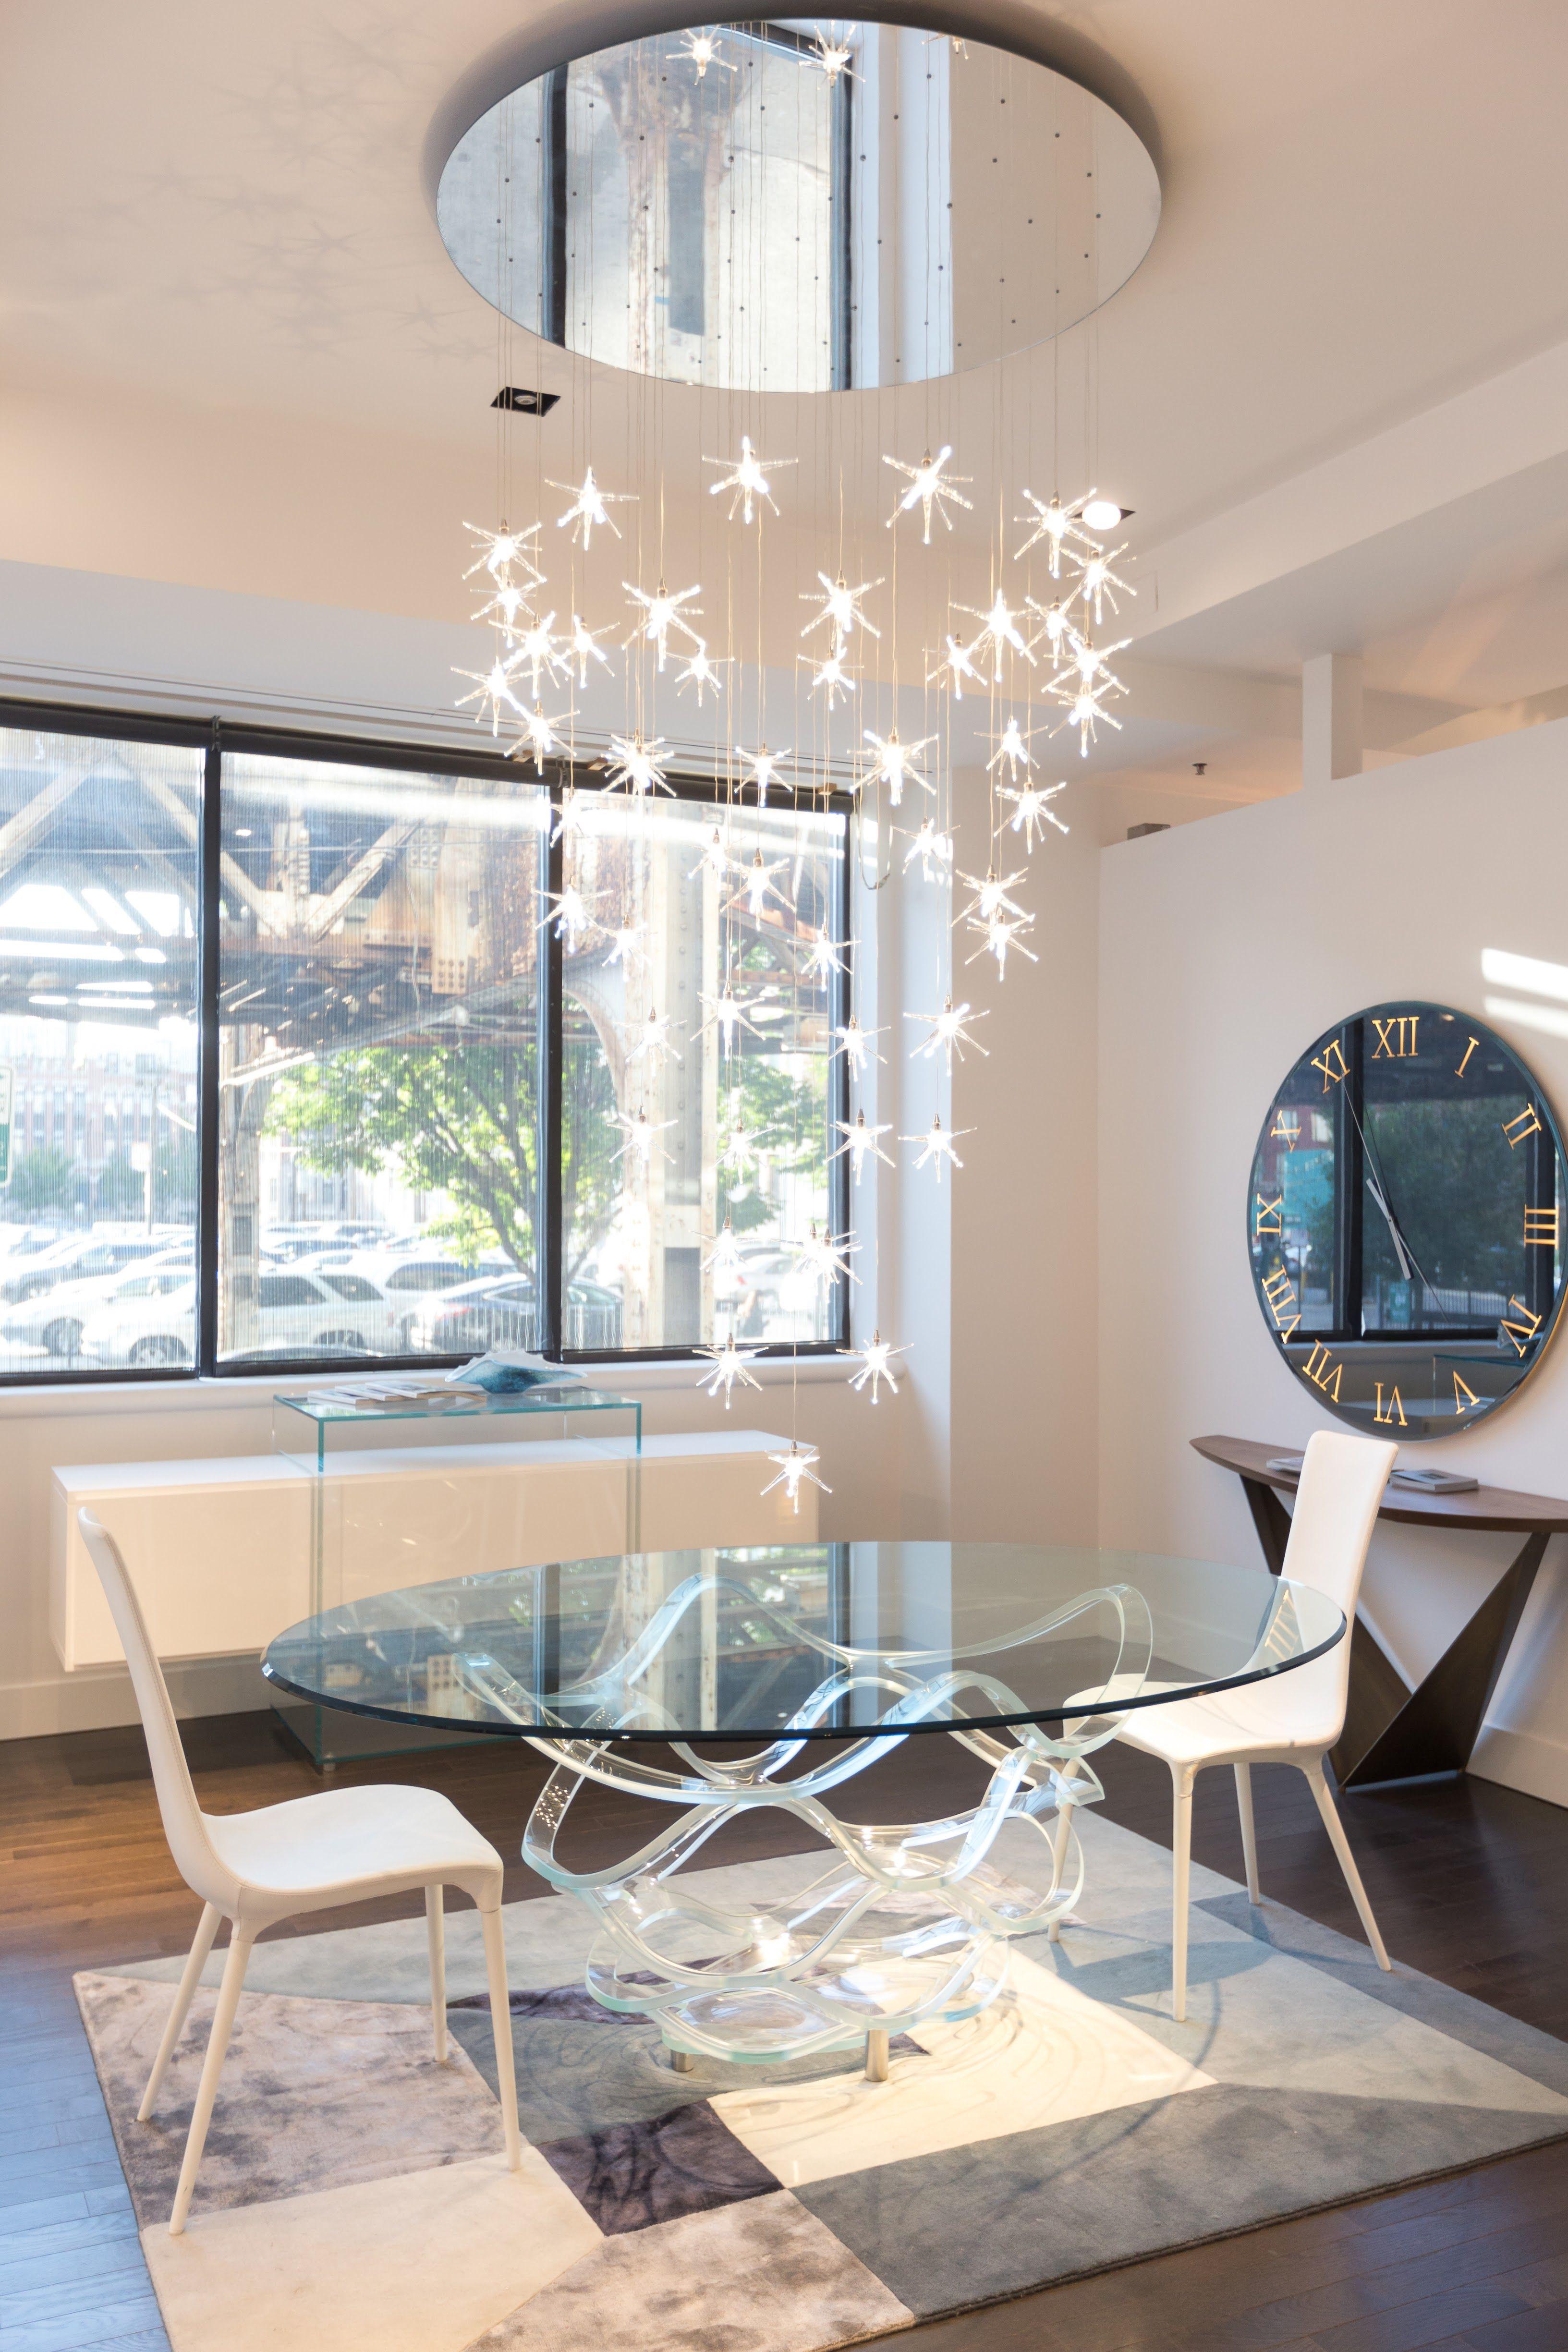 Reflex Kubo Sideboard, Neolitico Glass Dining Table U0026 Tango Dining Chairs